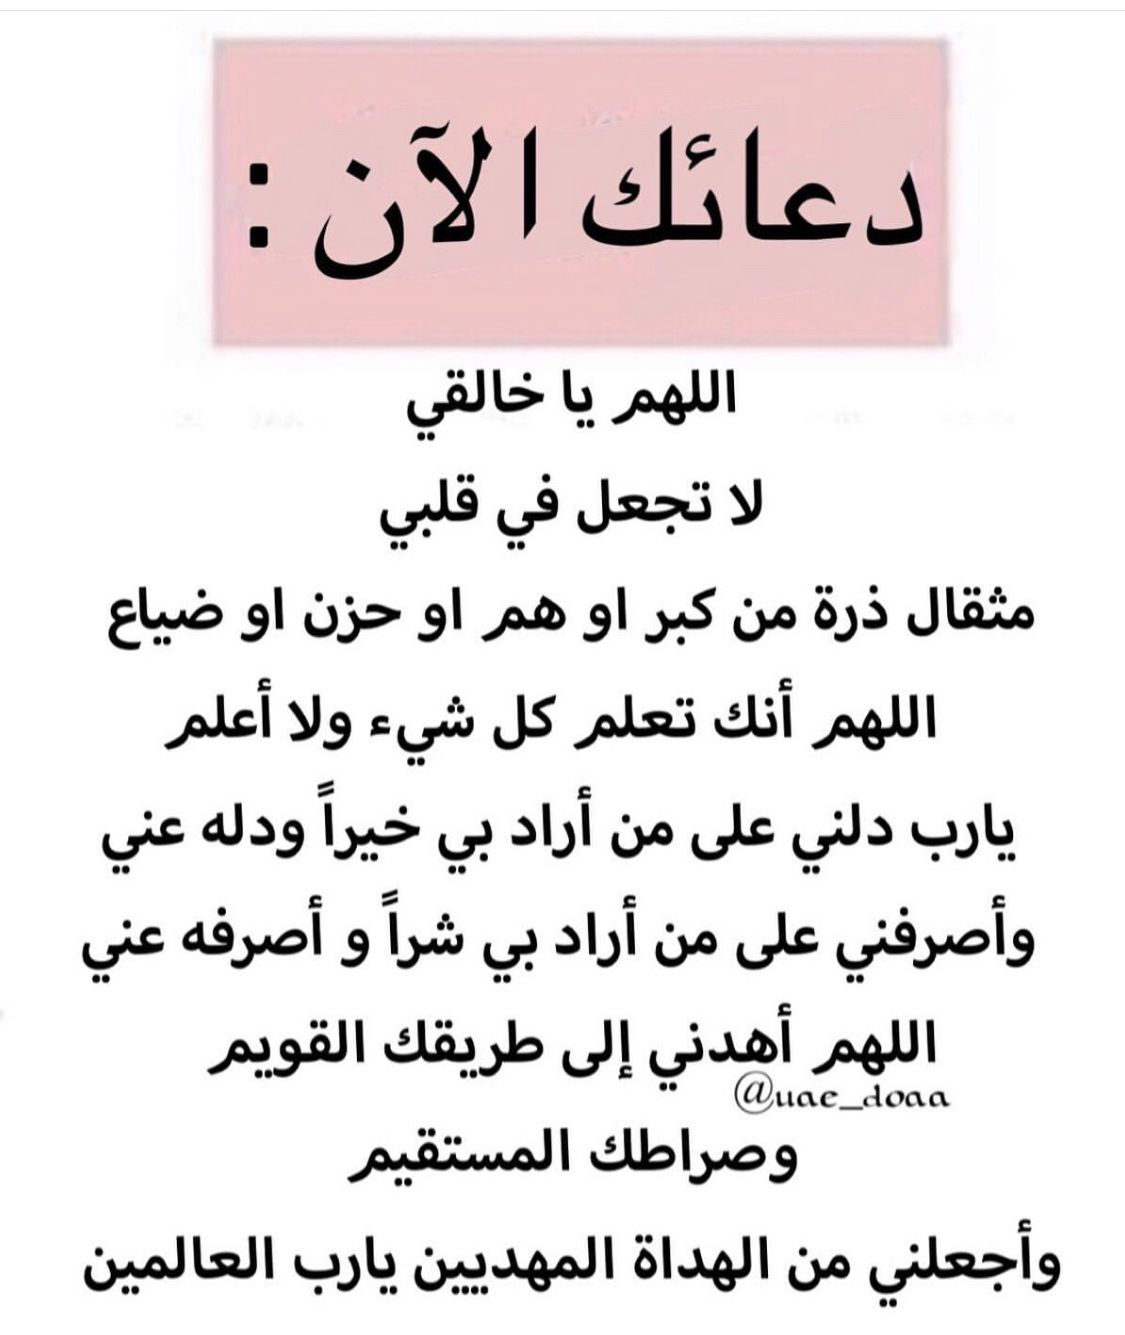 Pin By Fatimah On ادعية Duaa Islam Allah Islam Islam Quran